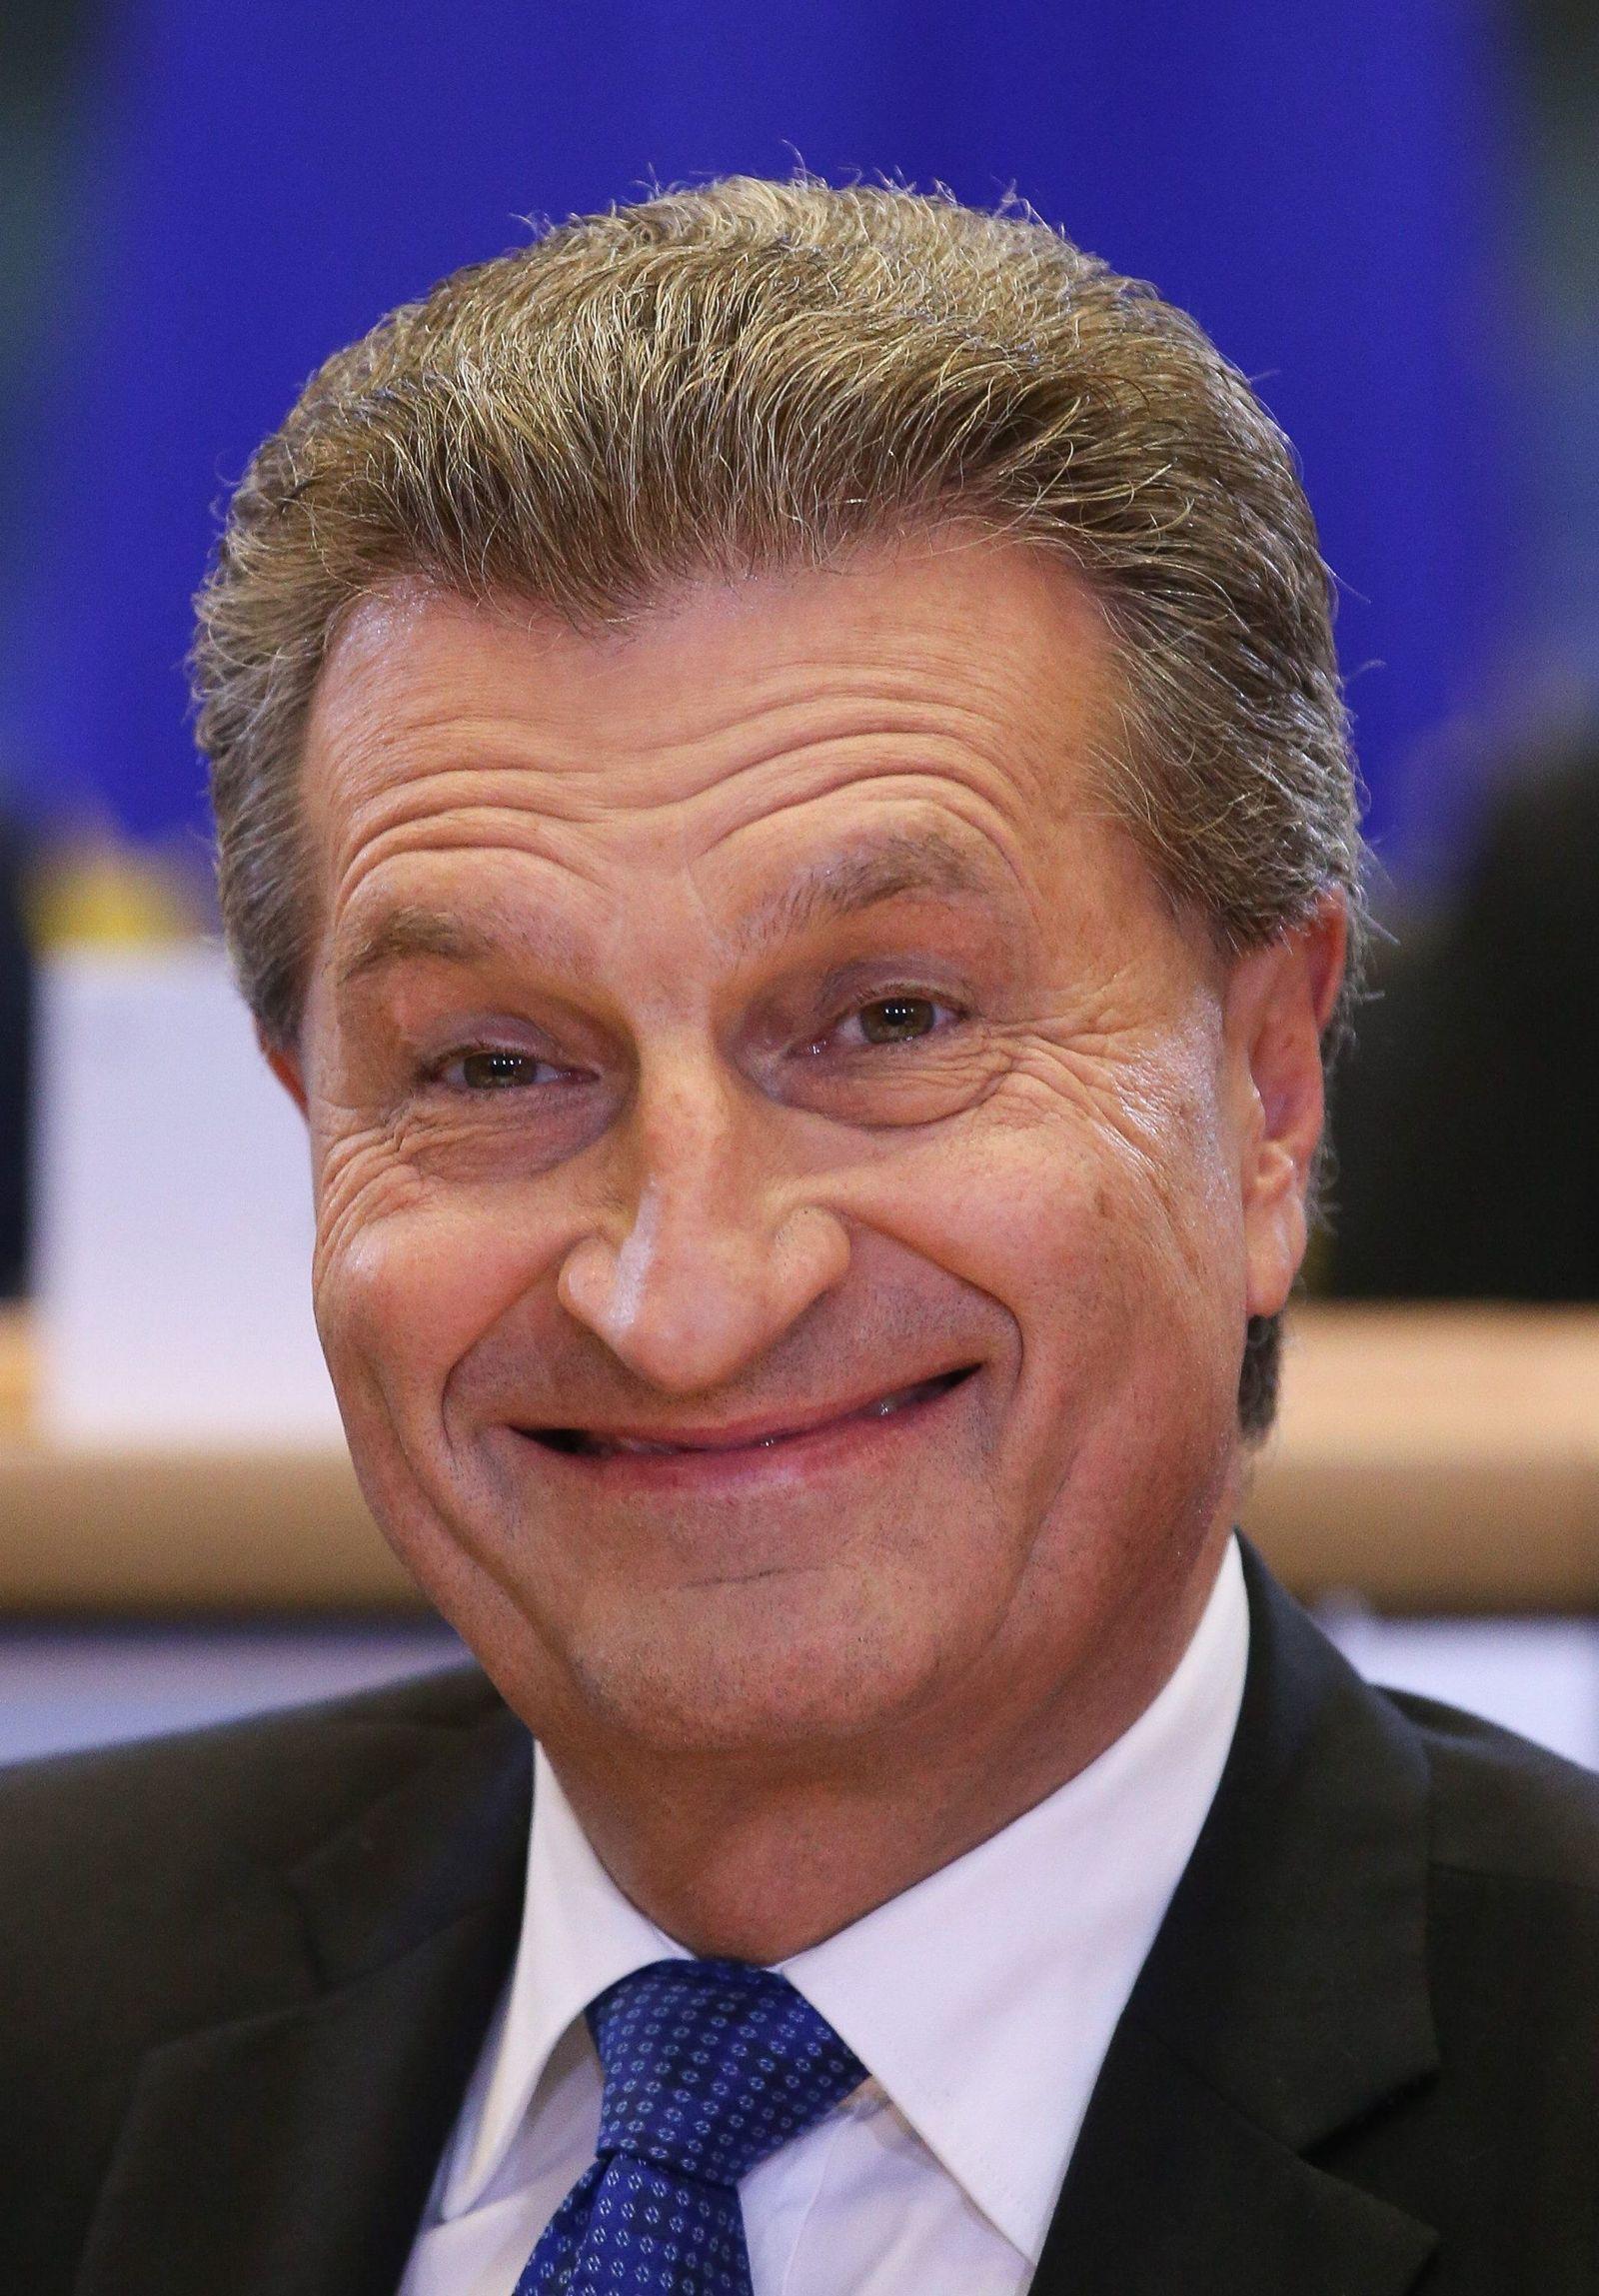 EU parliament starts questioning nominees for EU commission